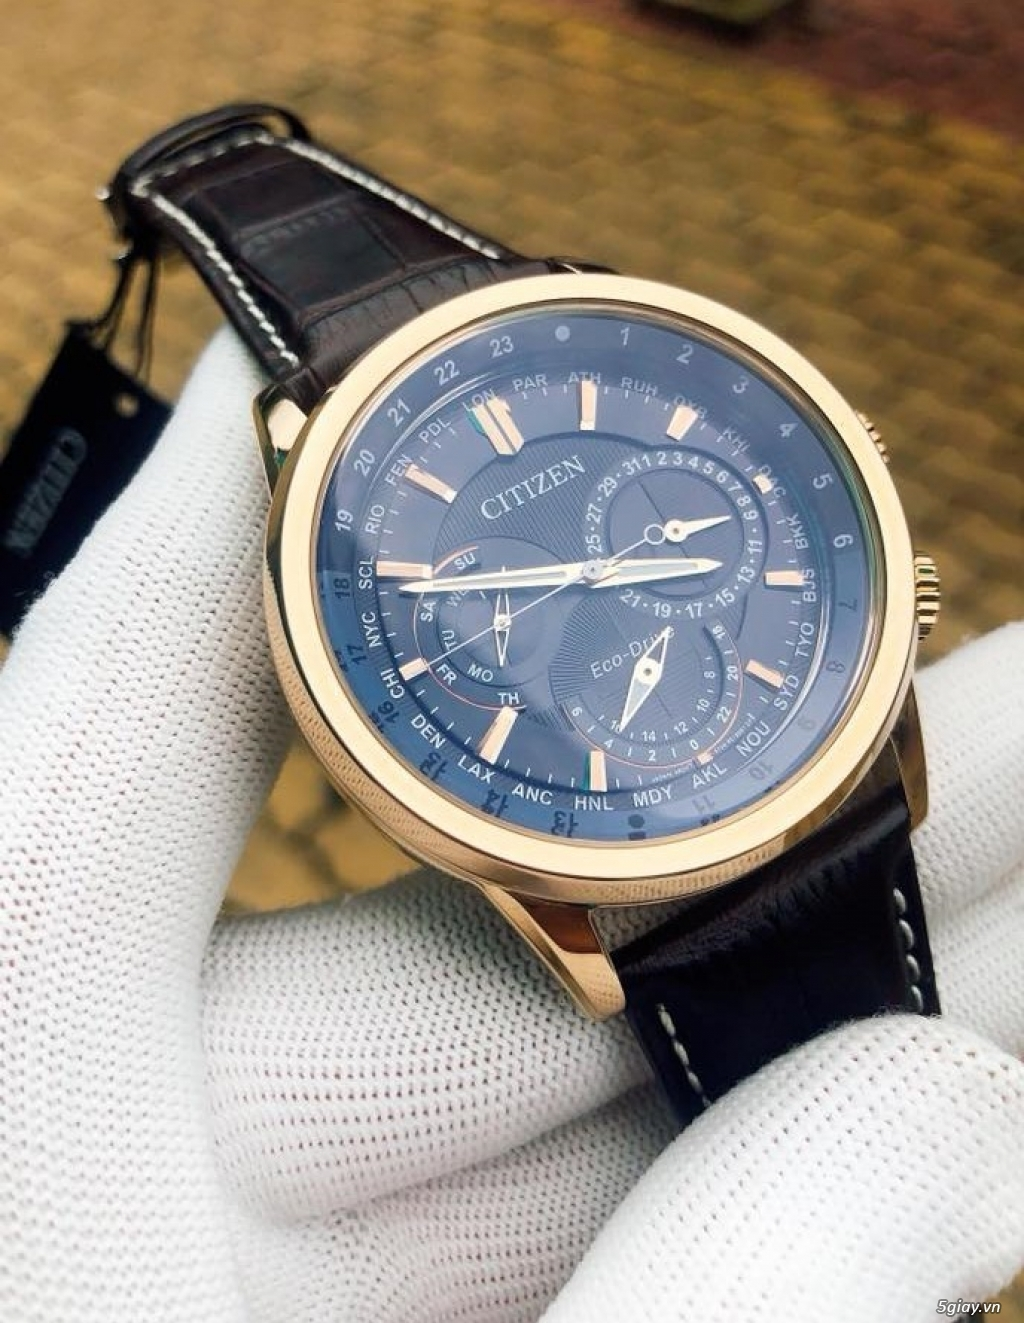 Đồng hồ Citizen giá tốt - 45